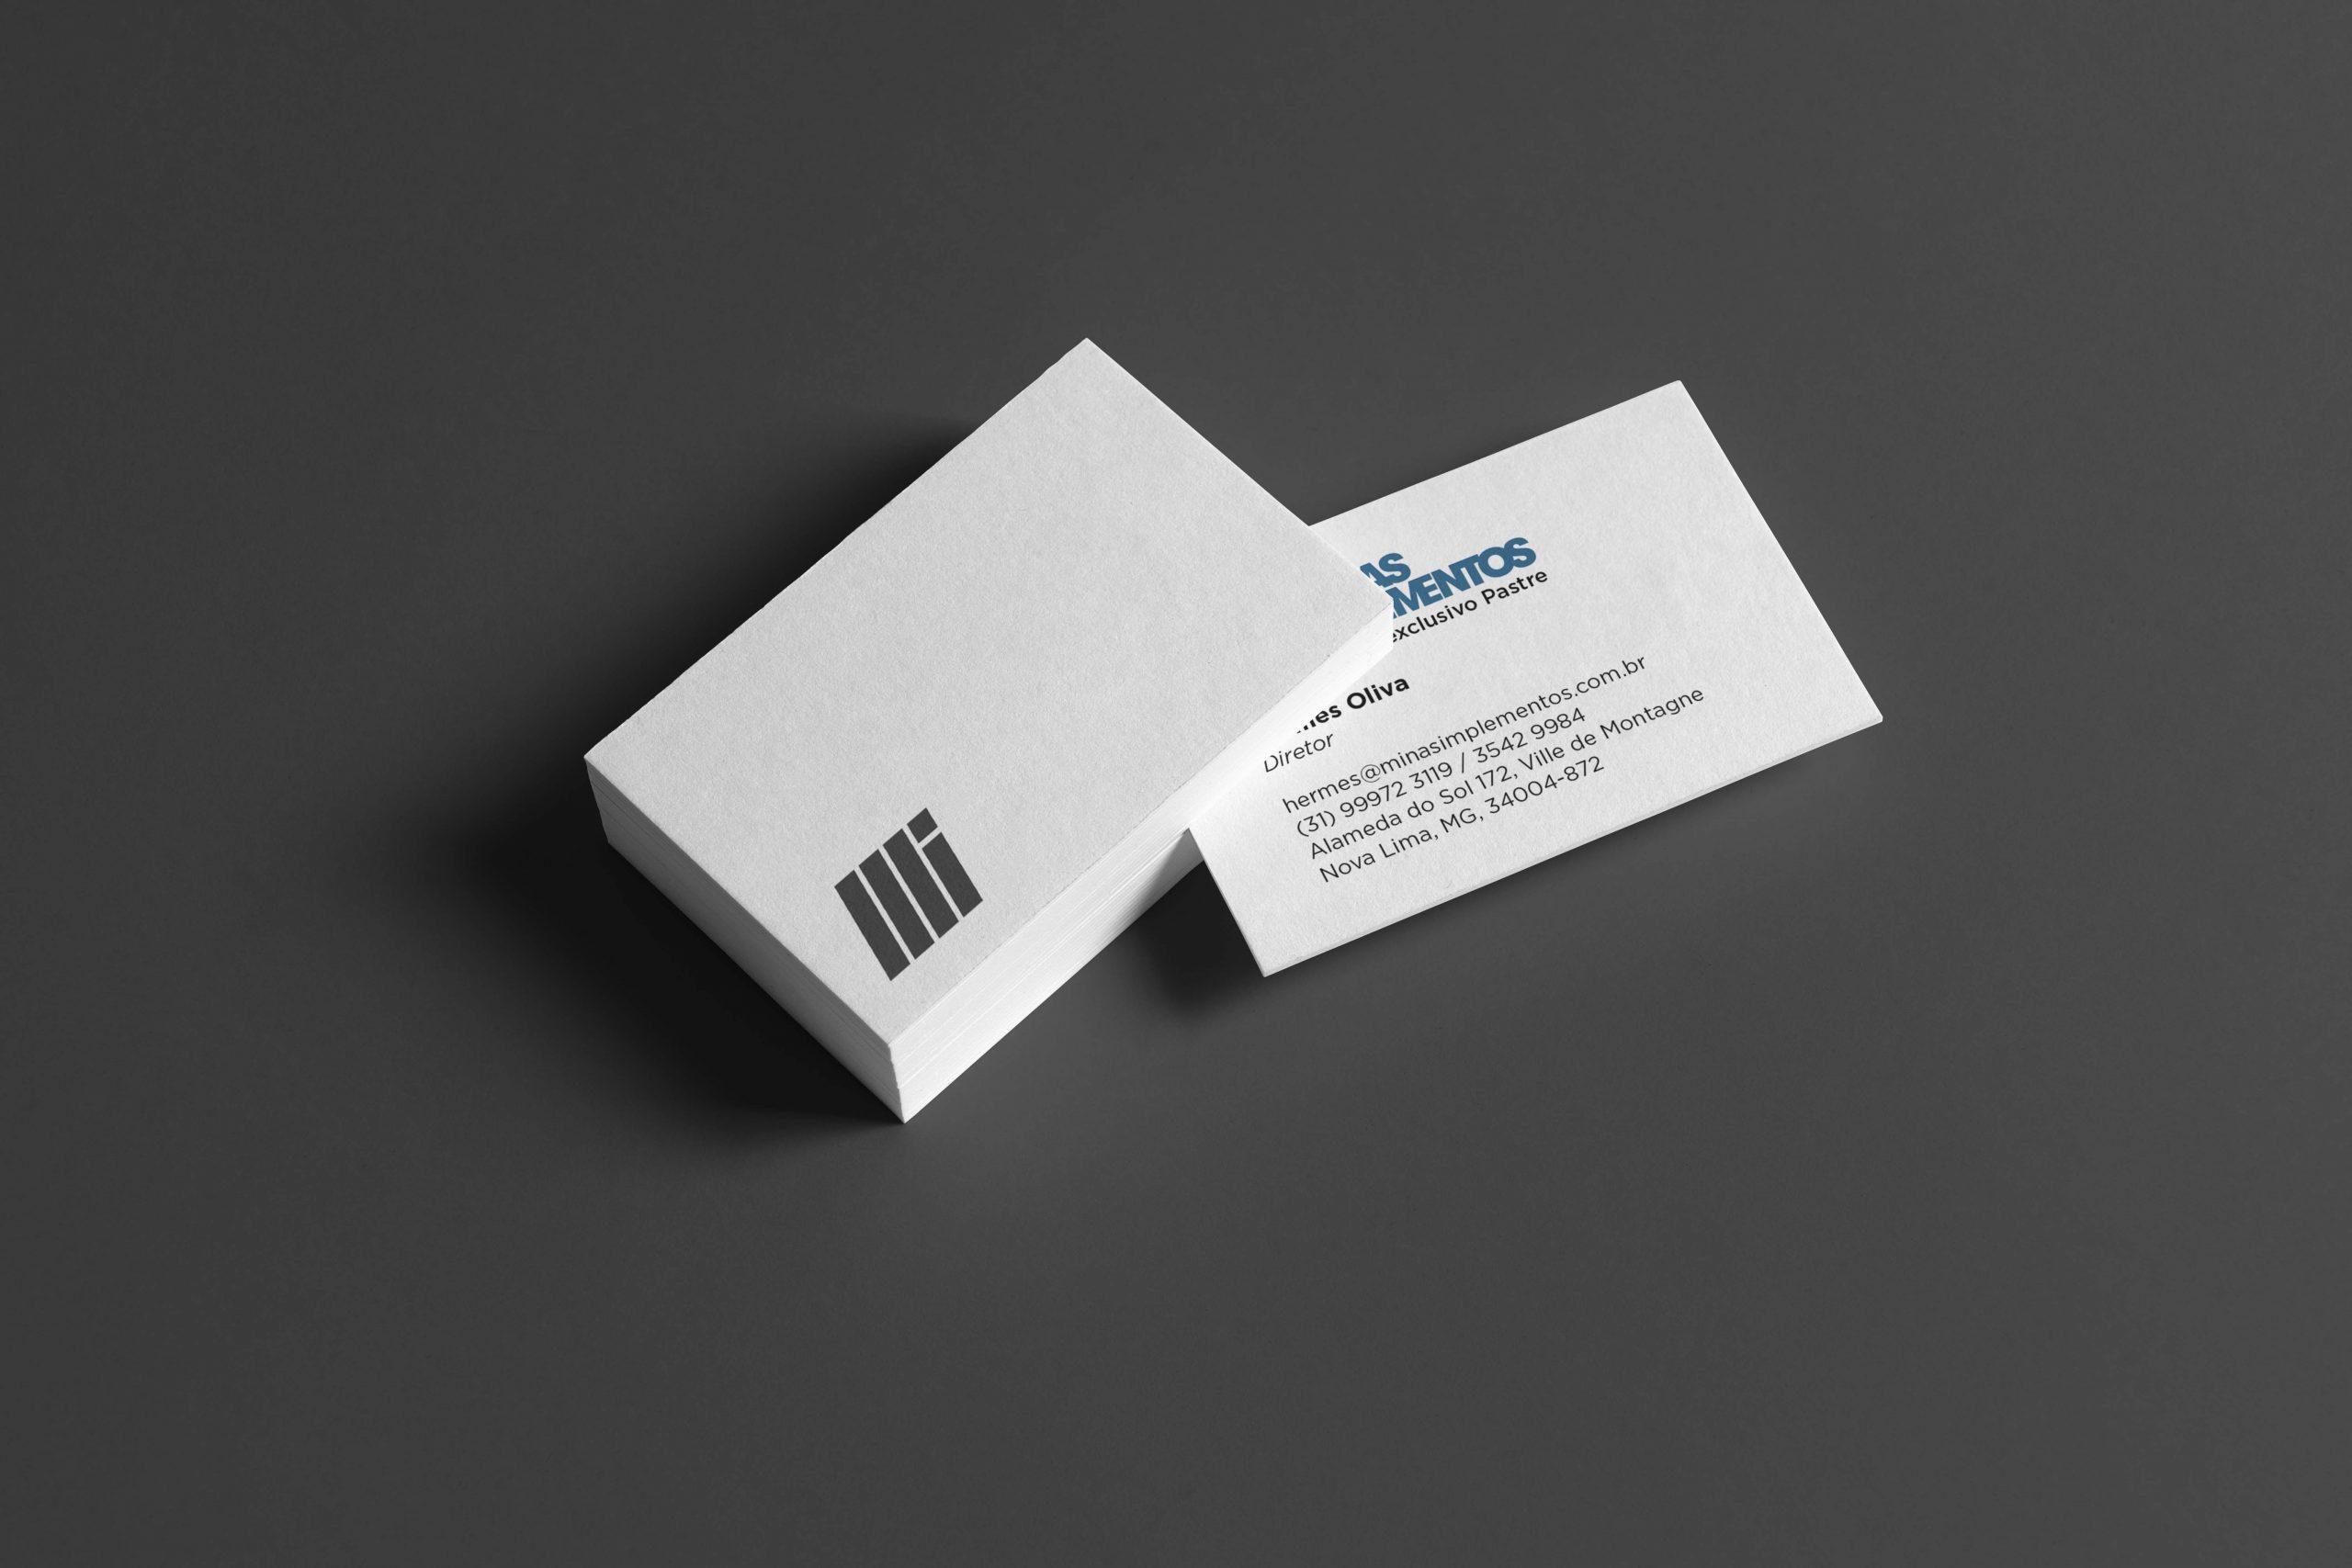 Minas-implementos-business-card-Daniel-Cavalcanti